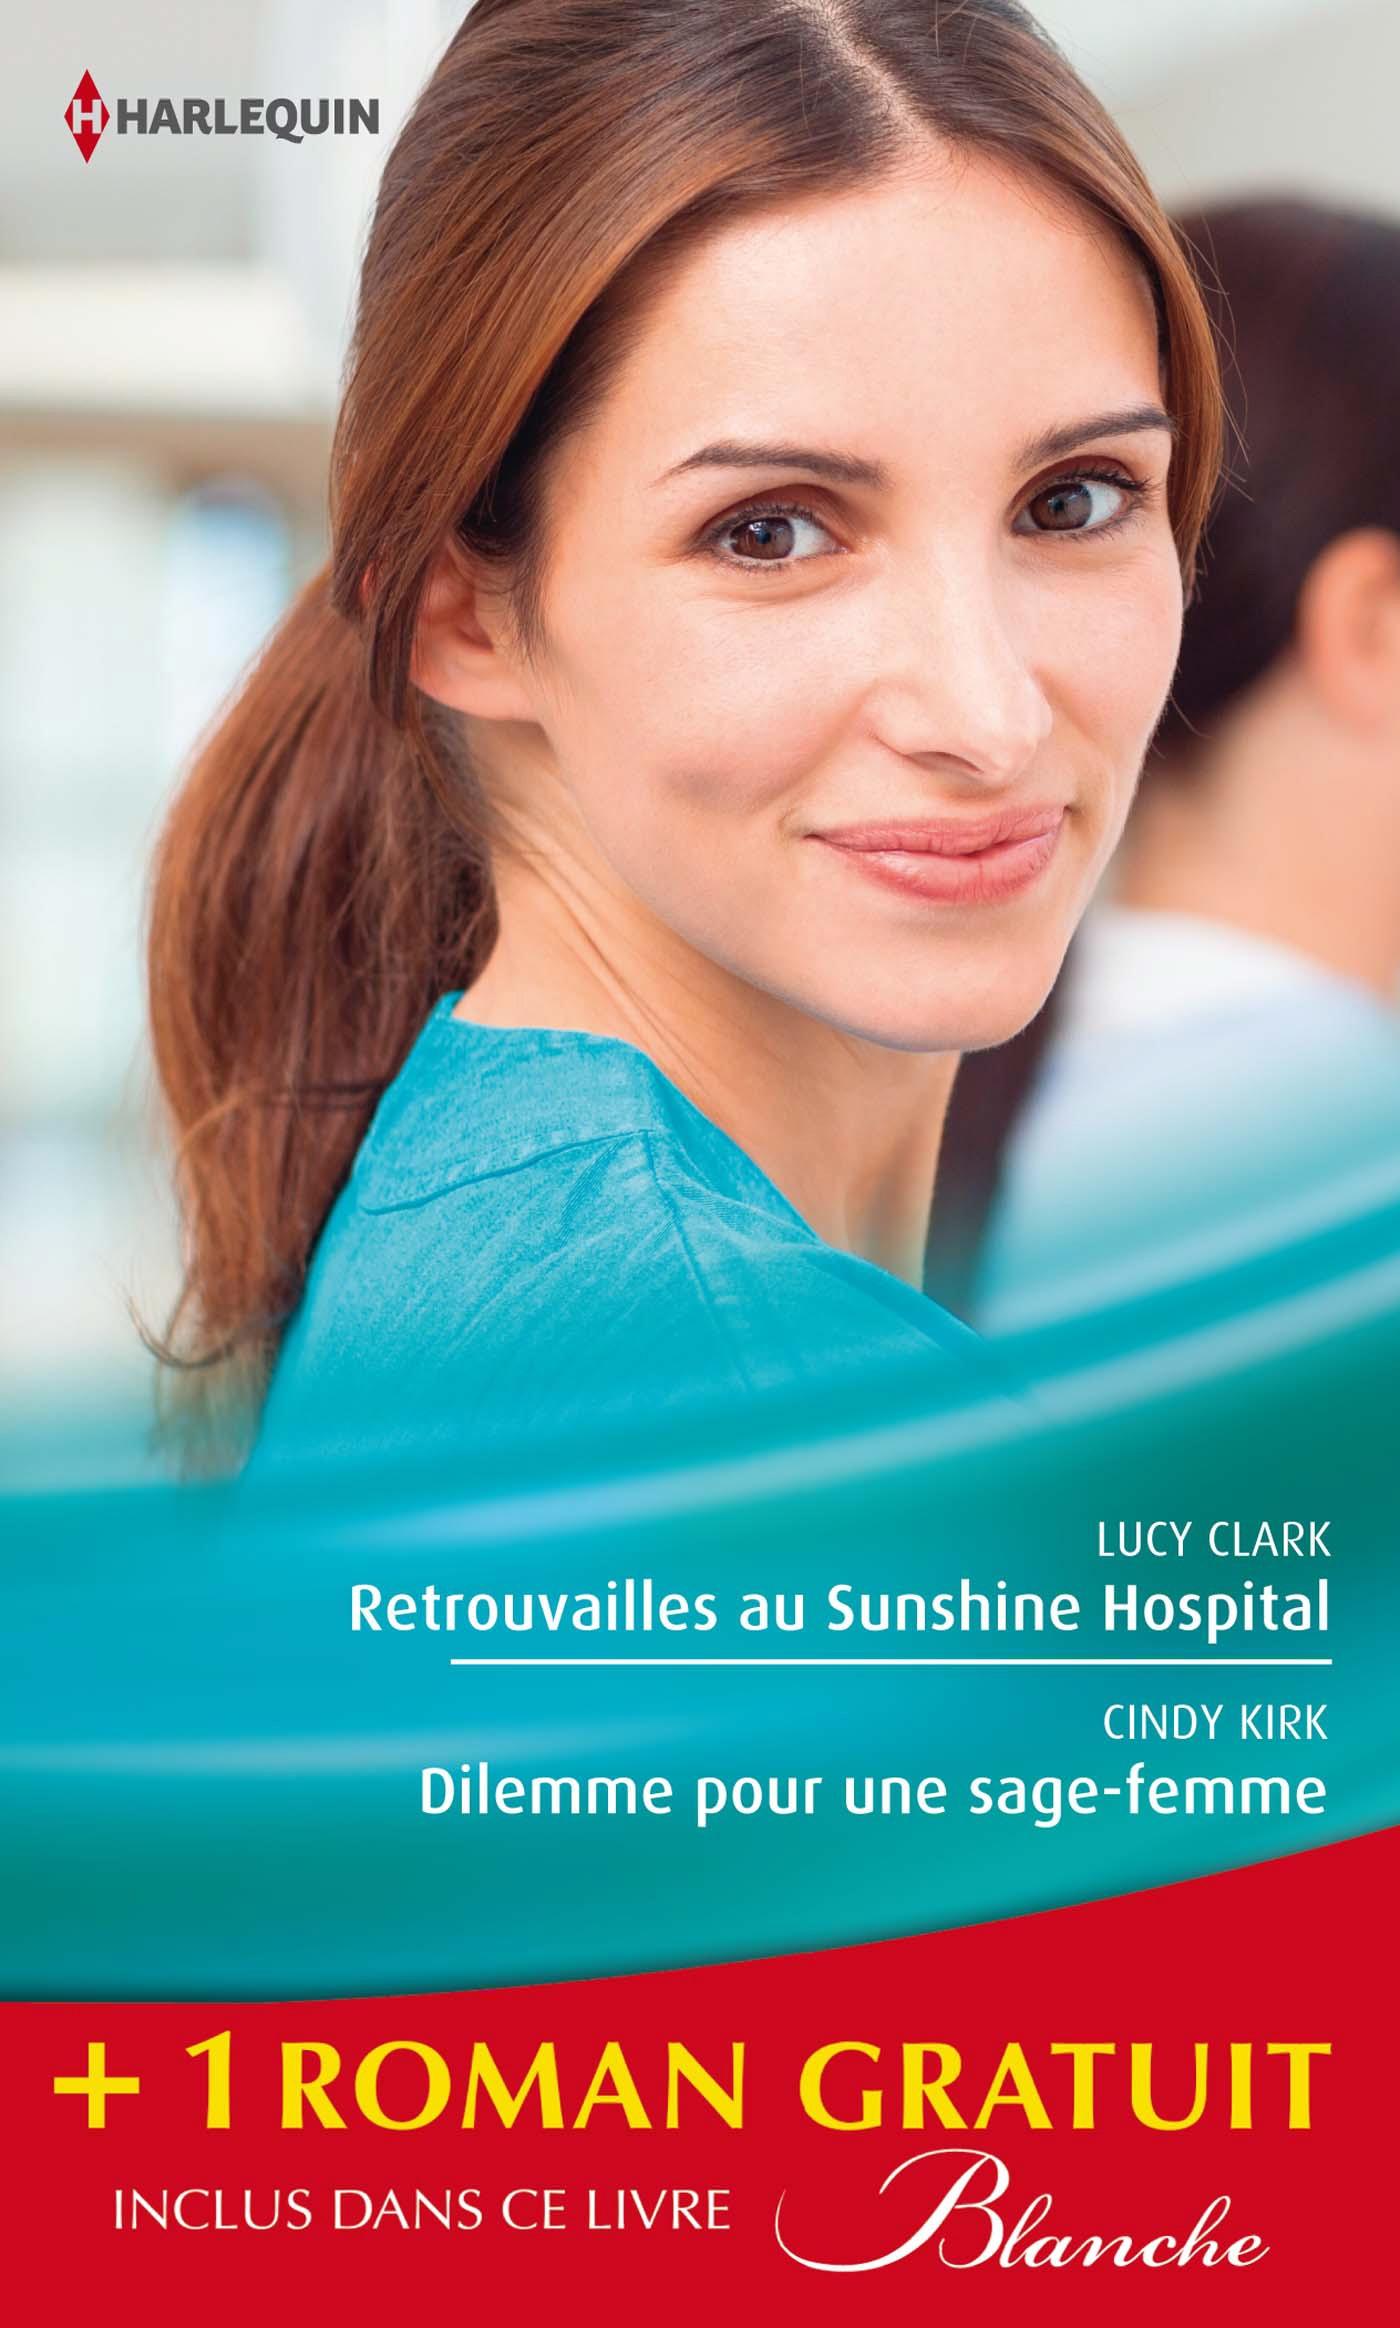 www.harlequin.fr/images/Livre-Hachette/HD/9782280310093.jpg